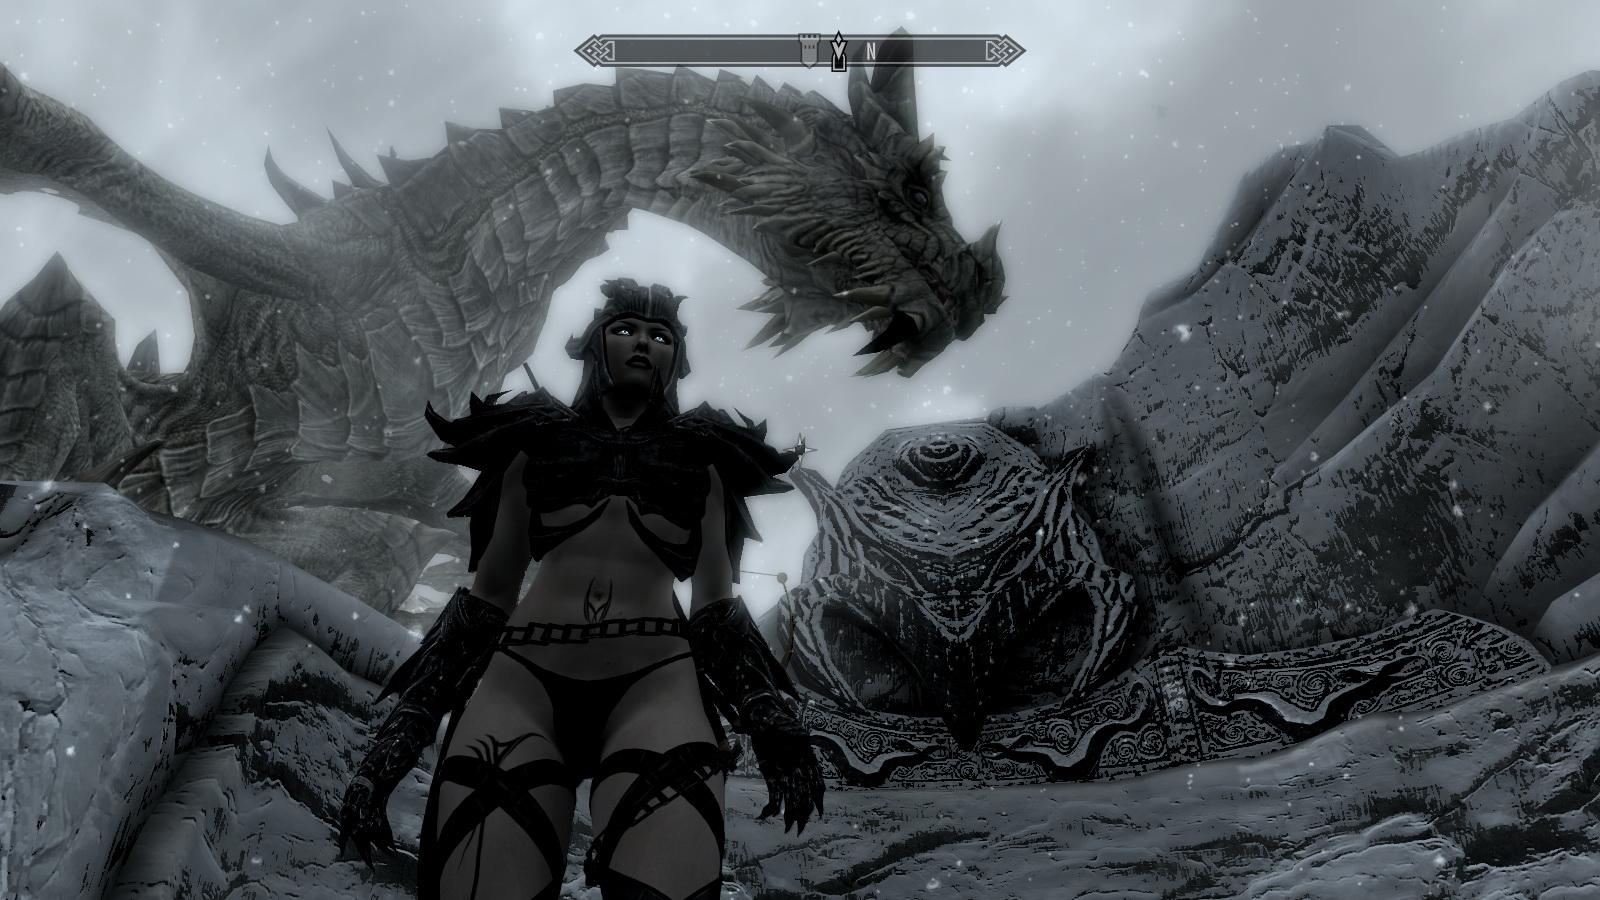 ScreenShot64.jpg - Elder Scrolls 5: Skyrim, the game girls